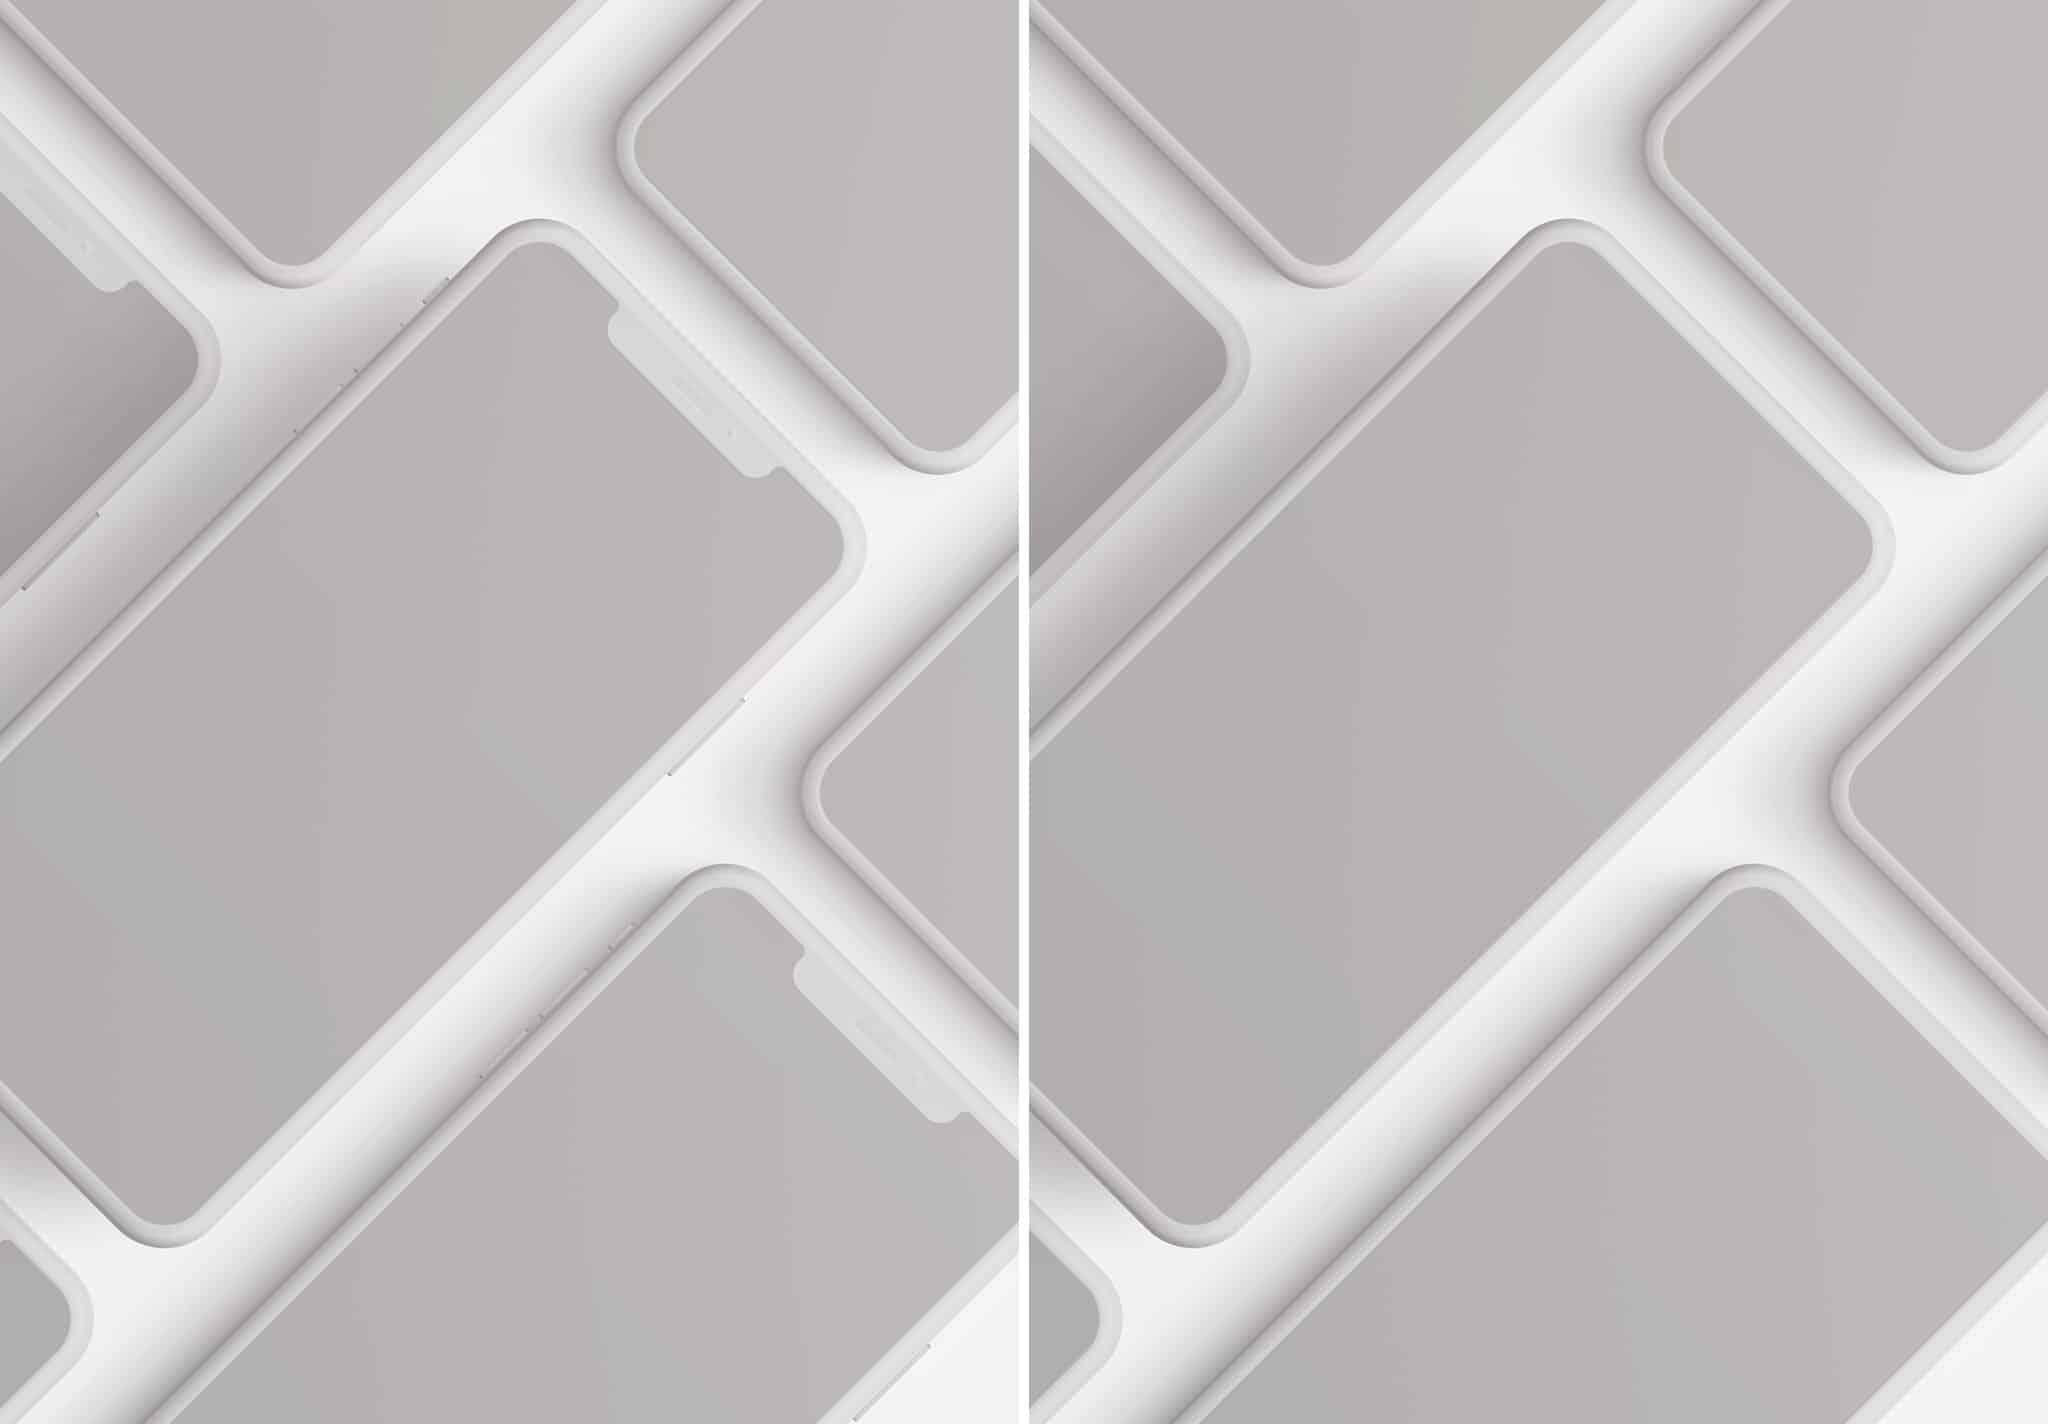 iphone smartphone clay layout 5 mockup image02